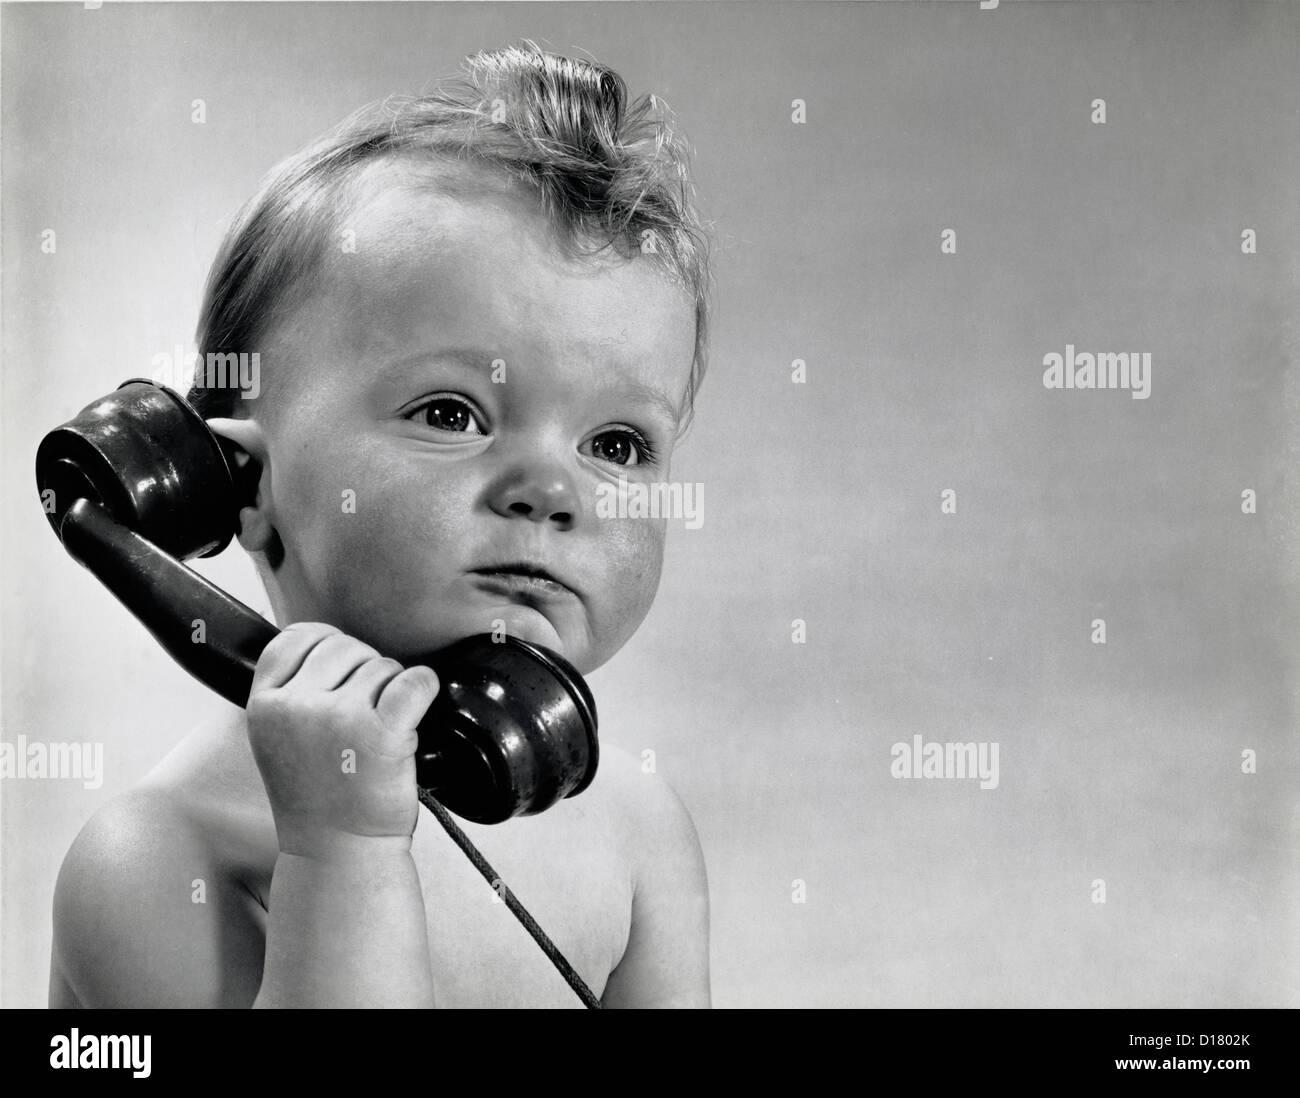 Vintage photo of baby boy talking on phone - Stock Image